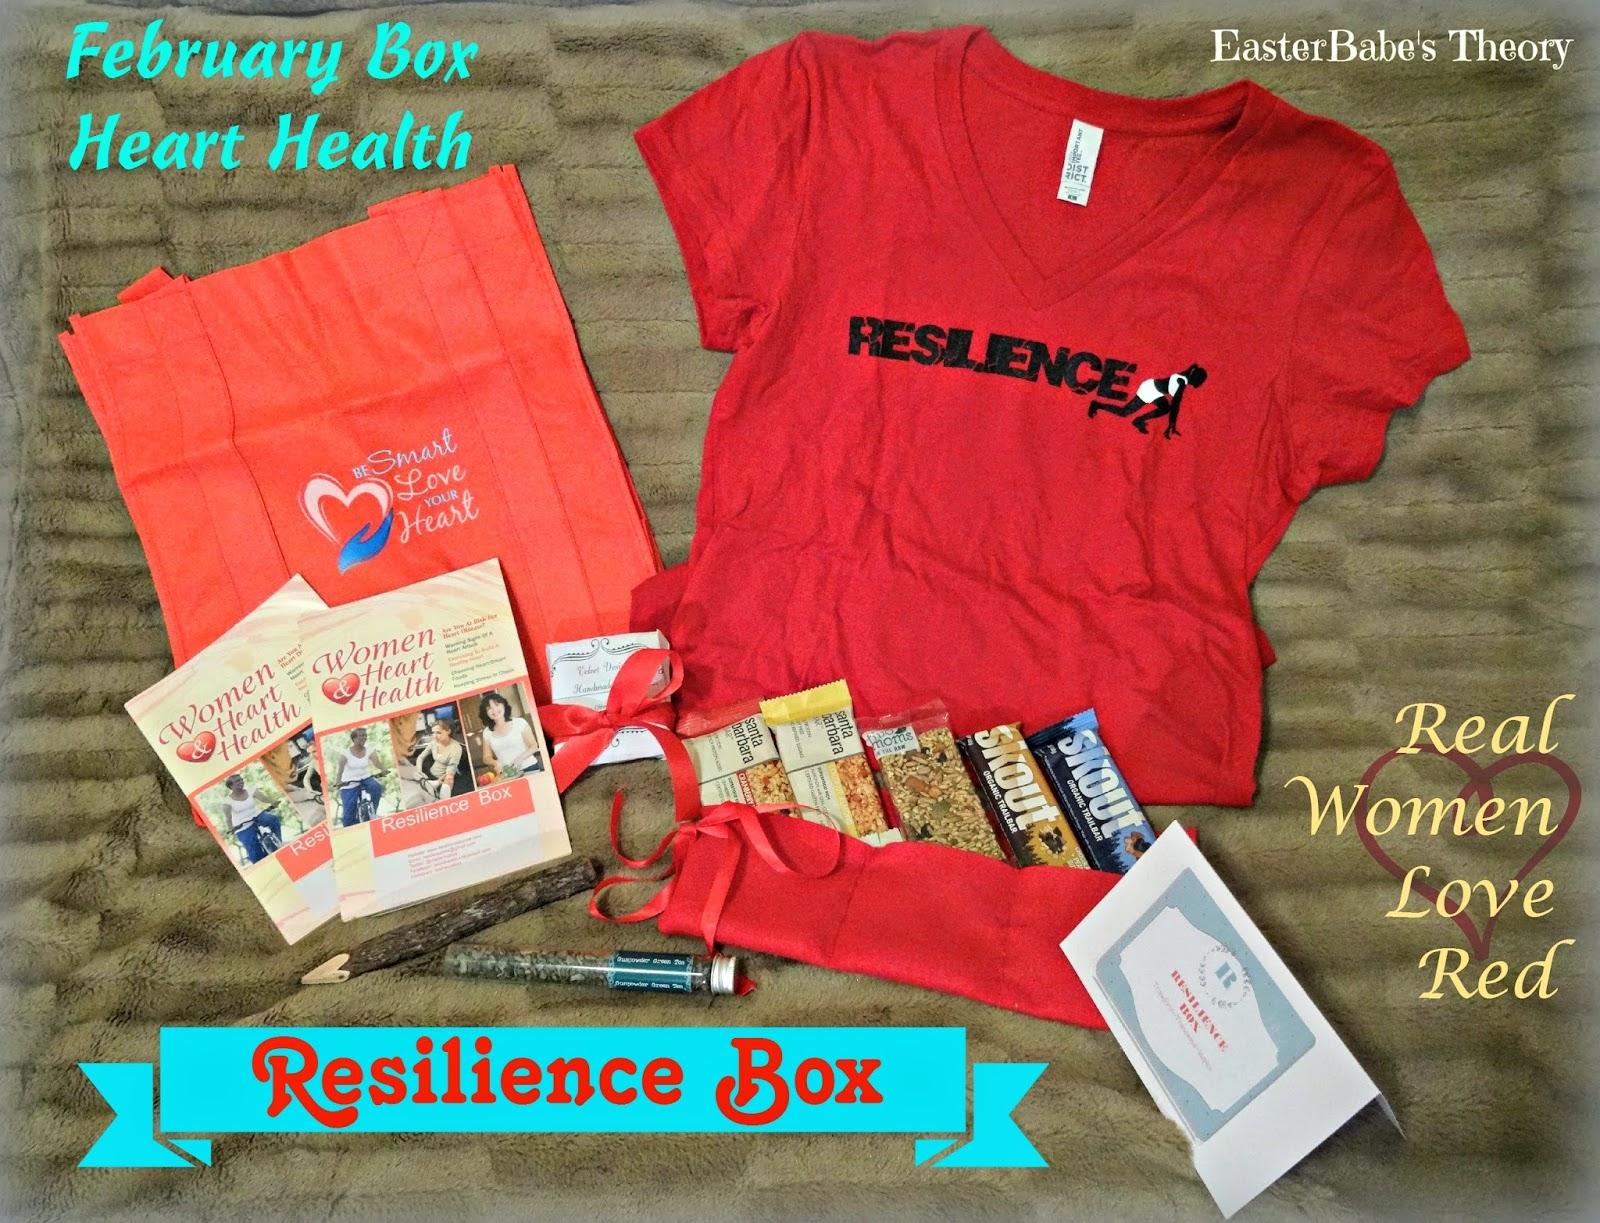 Resilience Subscription Gift Box Heart Health Womens Awareness Diseases Organic snacks